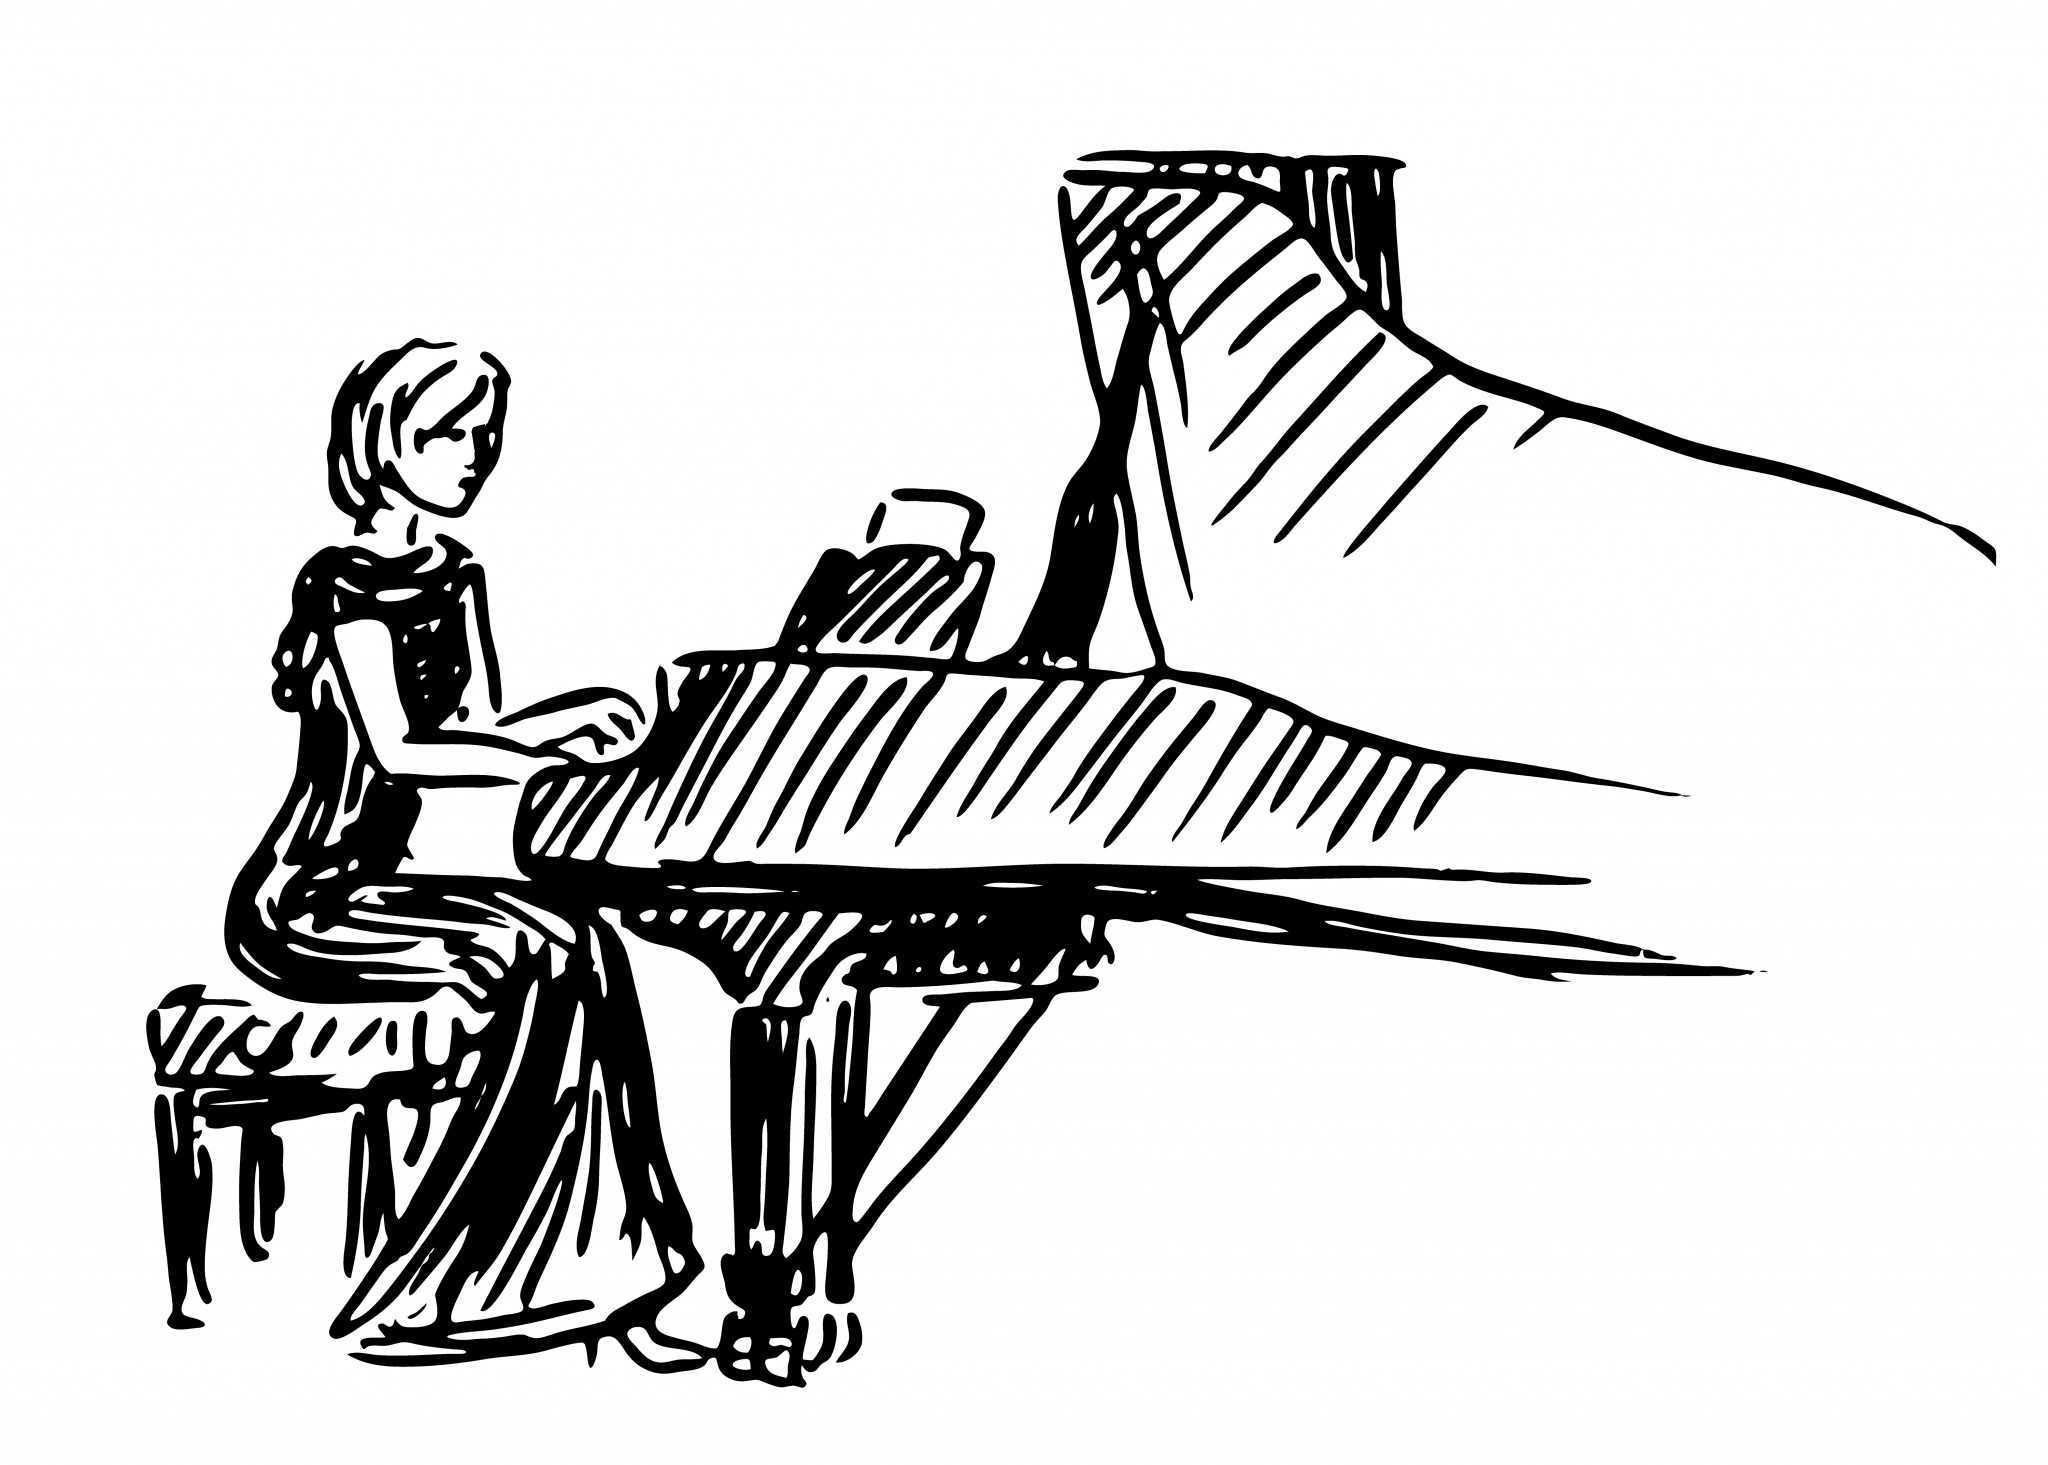 Pianist Drawing At Getdrawings